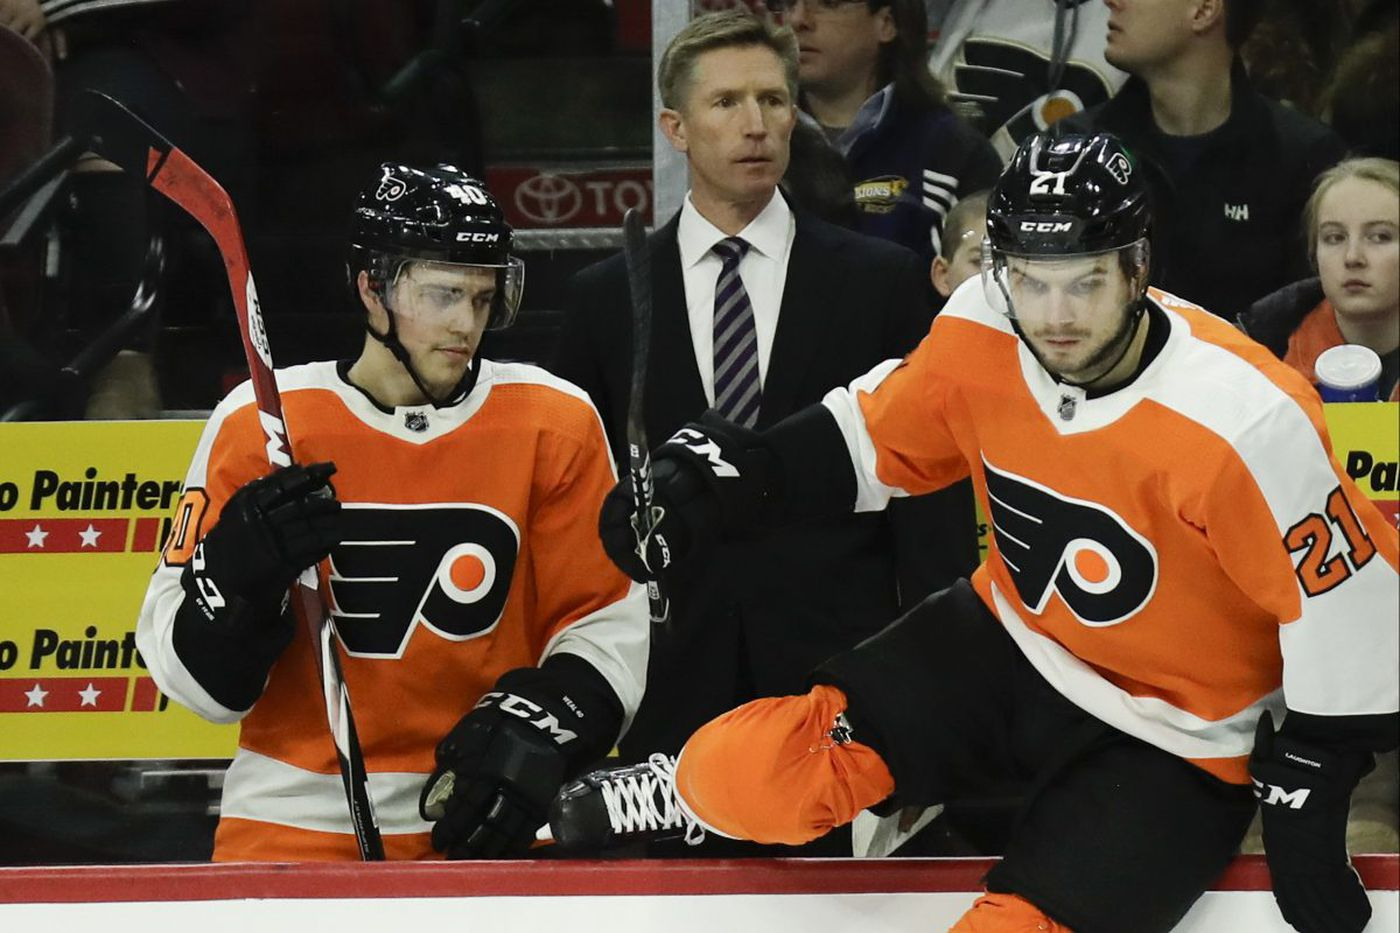 Flyers' coach Dave Hakstol's line reads have kept his team afloat